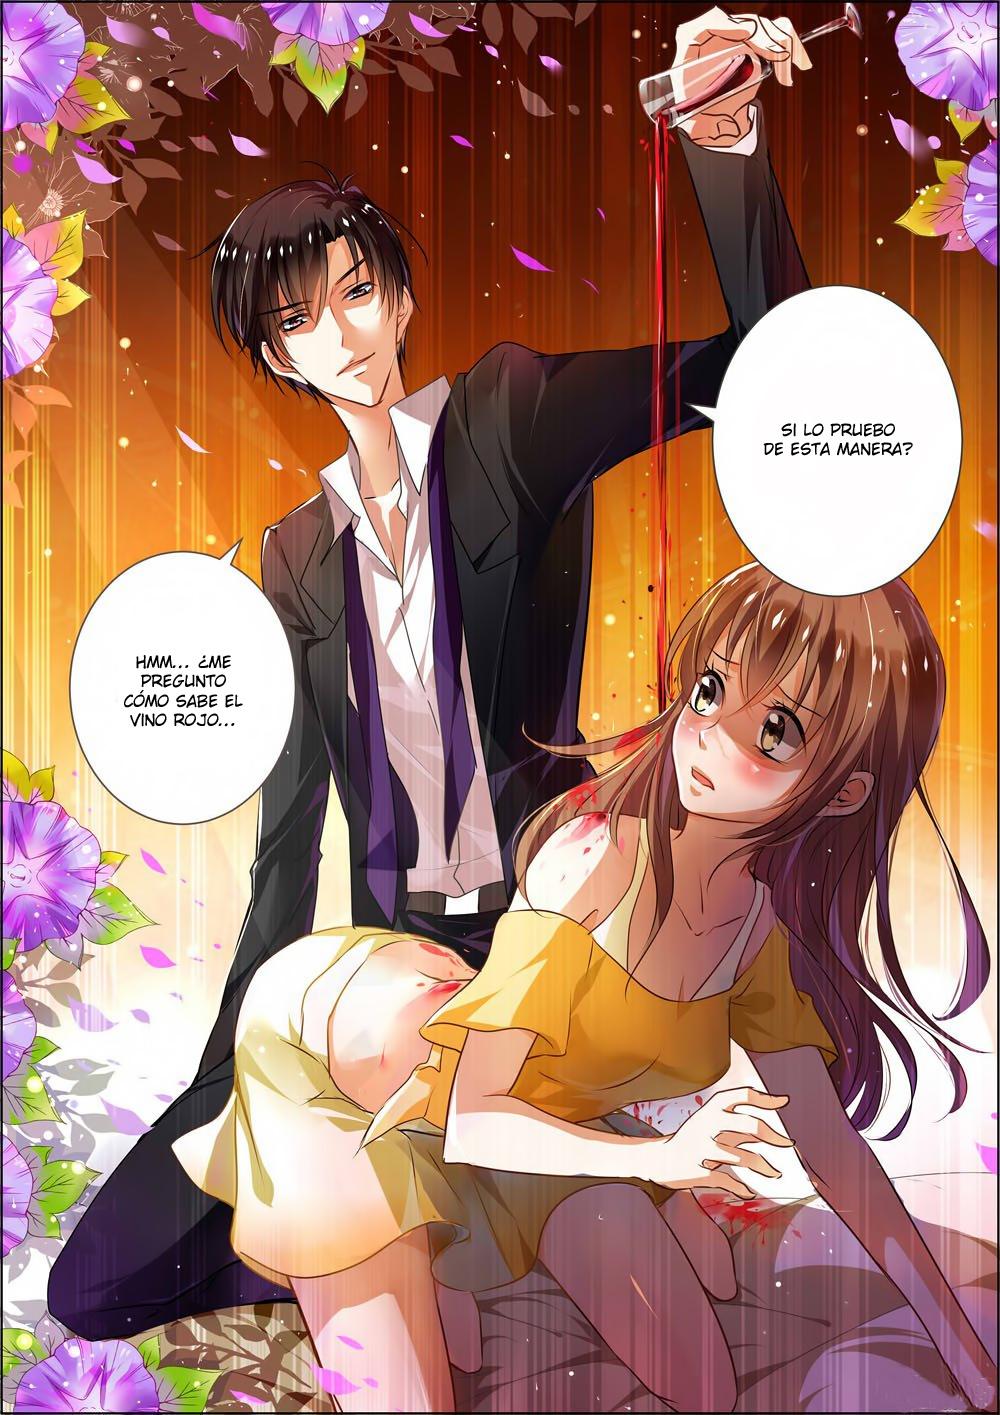 http://c5.ninemanga.com/es_manga/5/16069/395470/caea756b29bd071f00ce526f40645a78.jpg Page 7